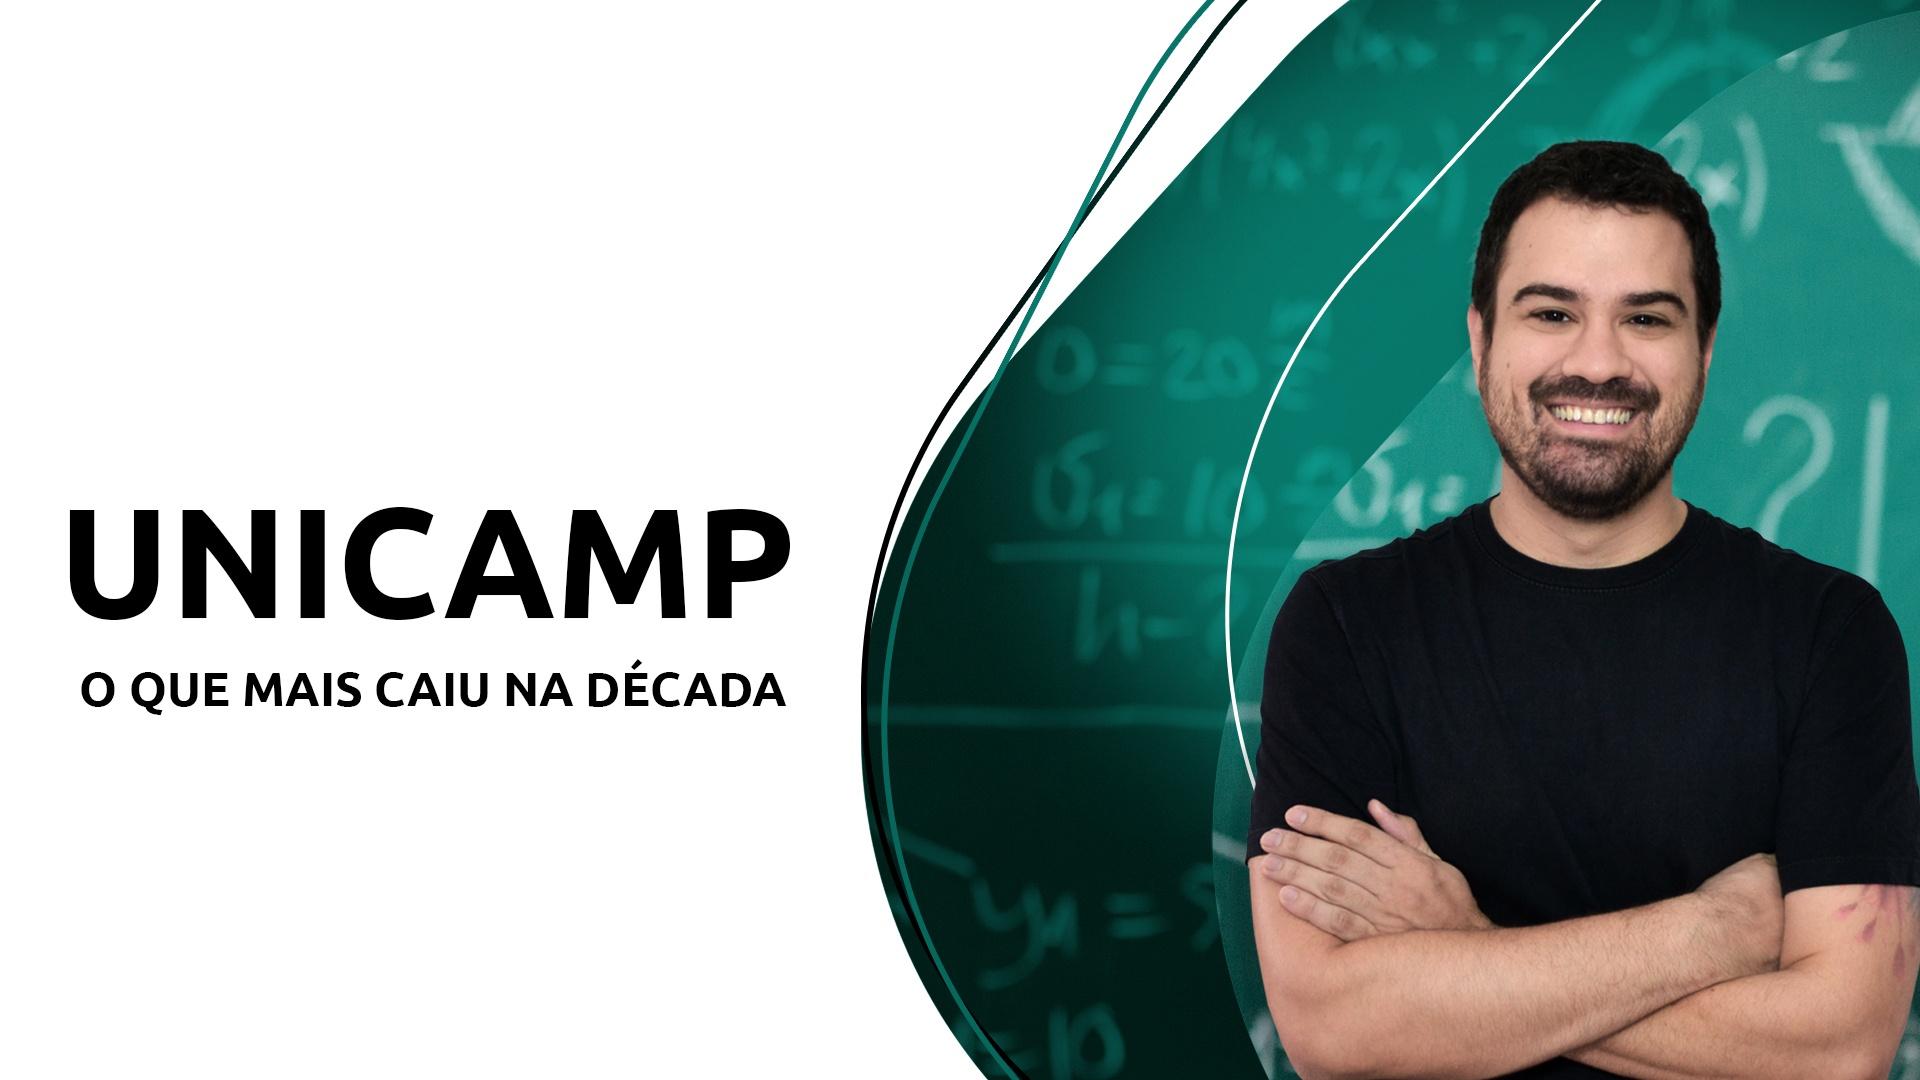 Prof. Gabriel Miranda - Curso de Matemática - Unicamp